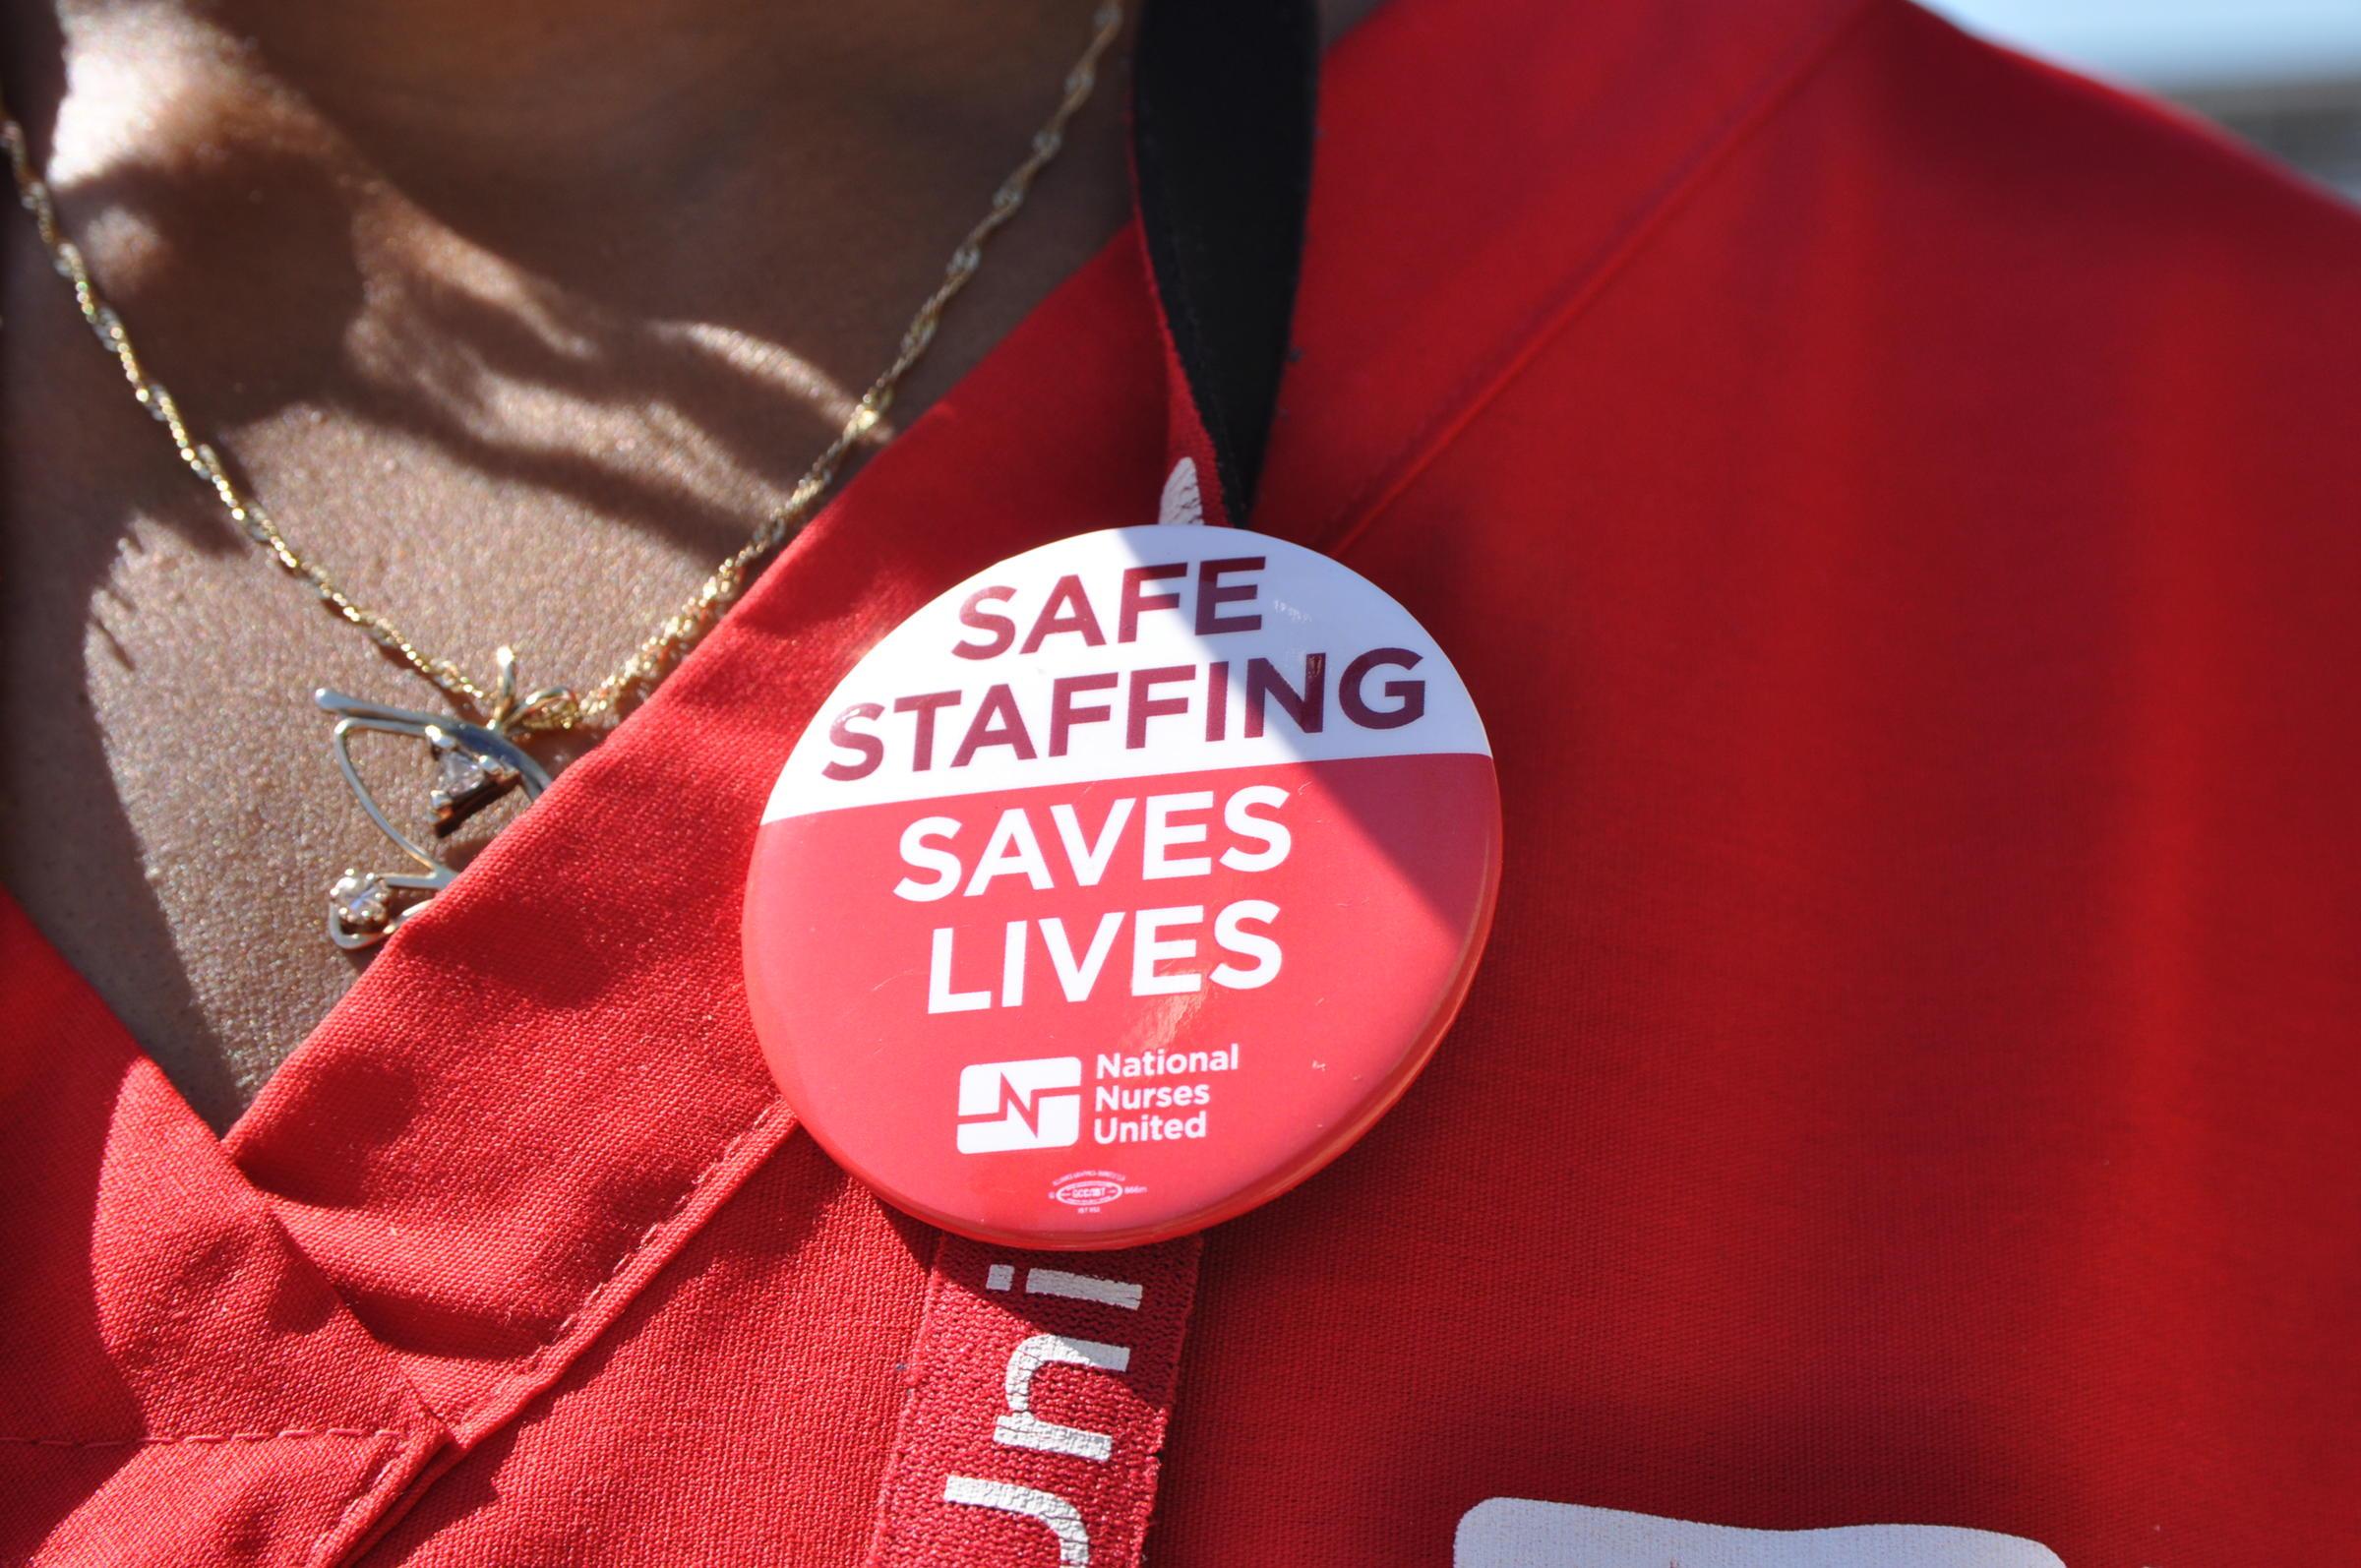 Nurses union says staffing inadequate at Saint Louis University – What Makes a Good Icu Nurse